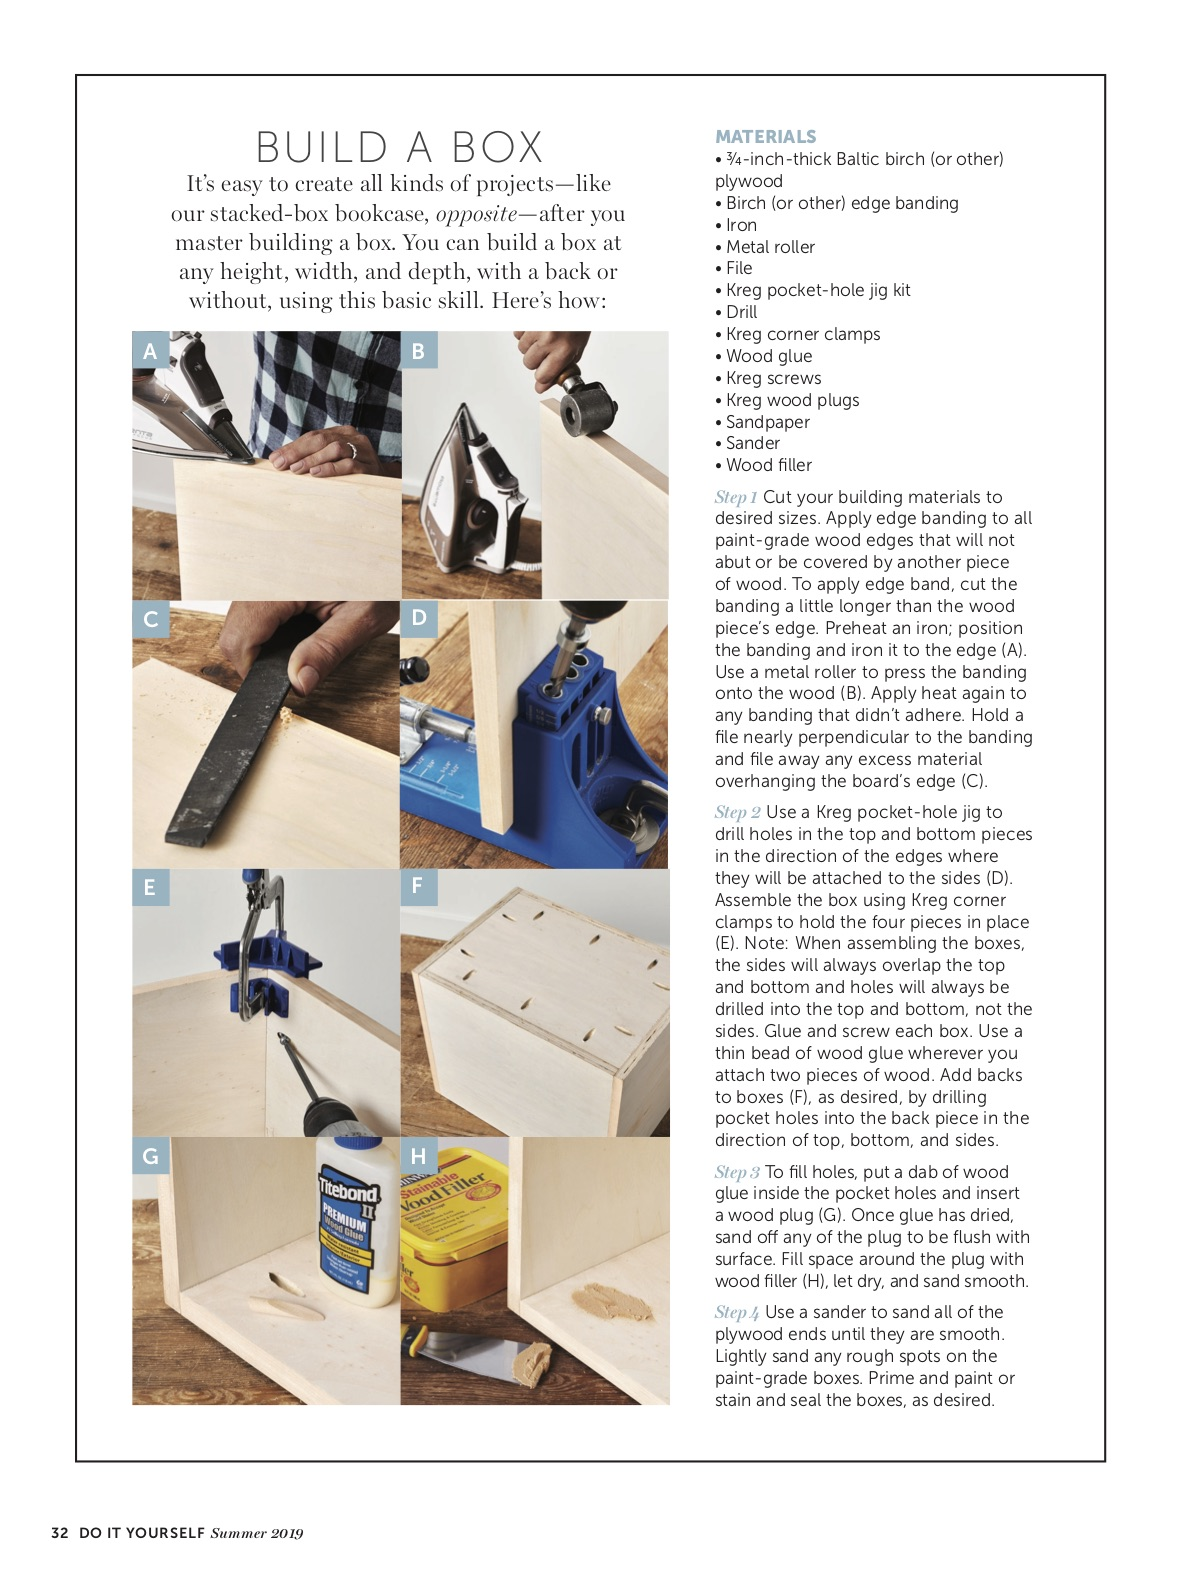 026-035 DIY1619 WTDW Kreg Jig7.jpg